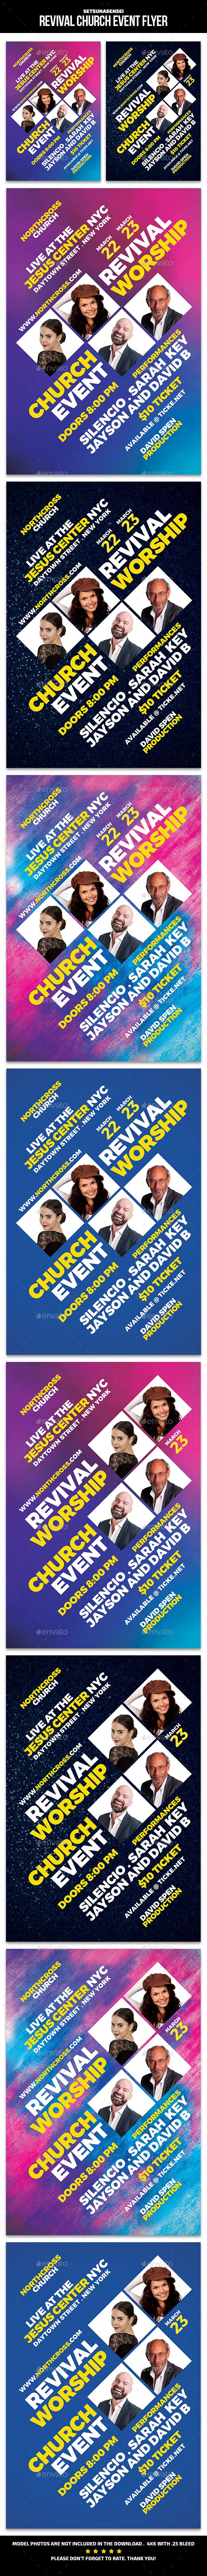 Revival Church Event Flyer - Church Flyers